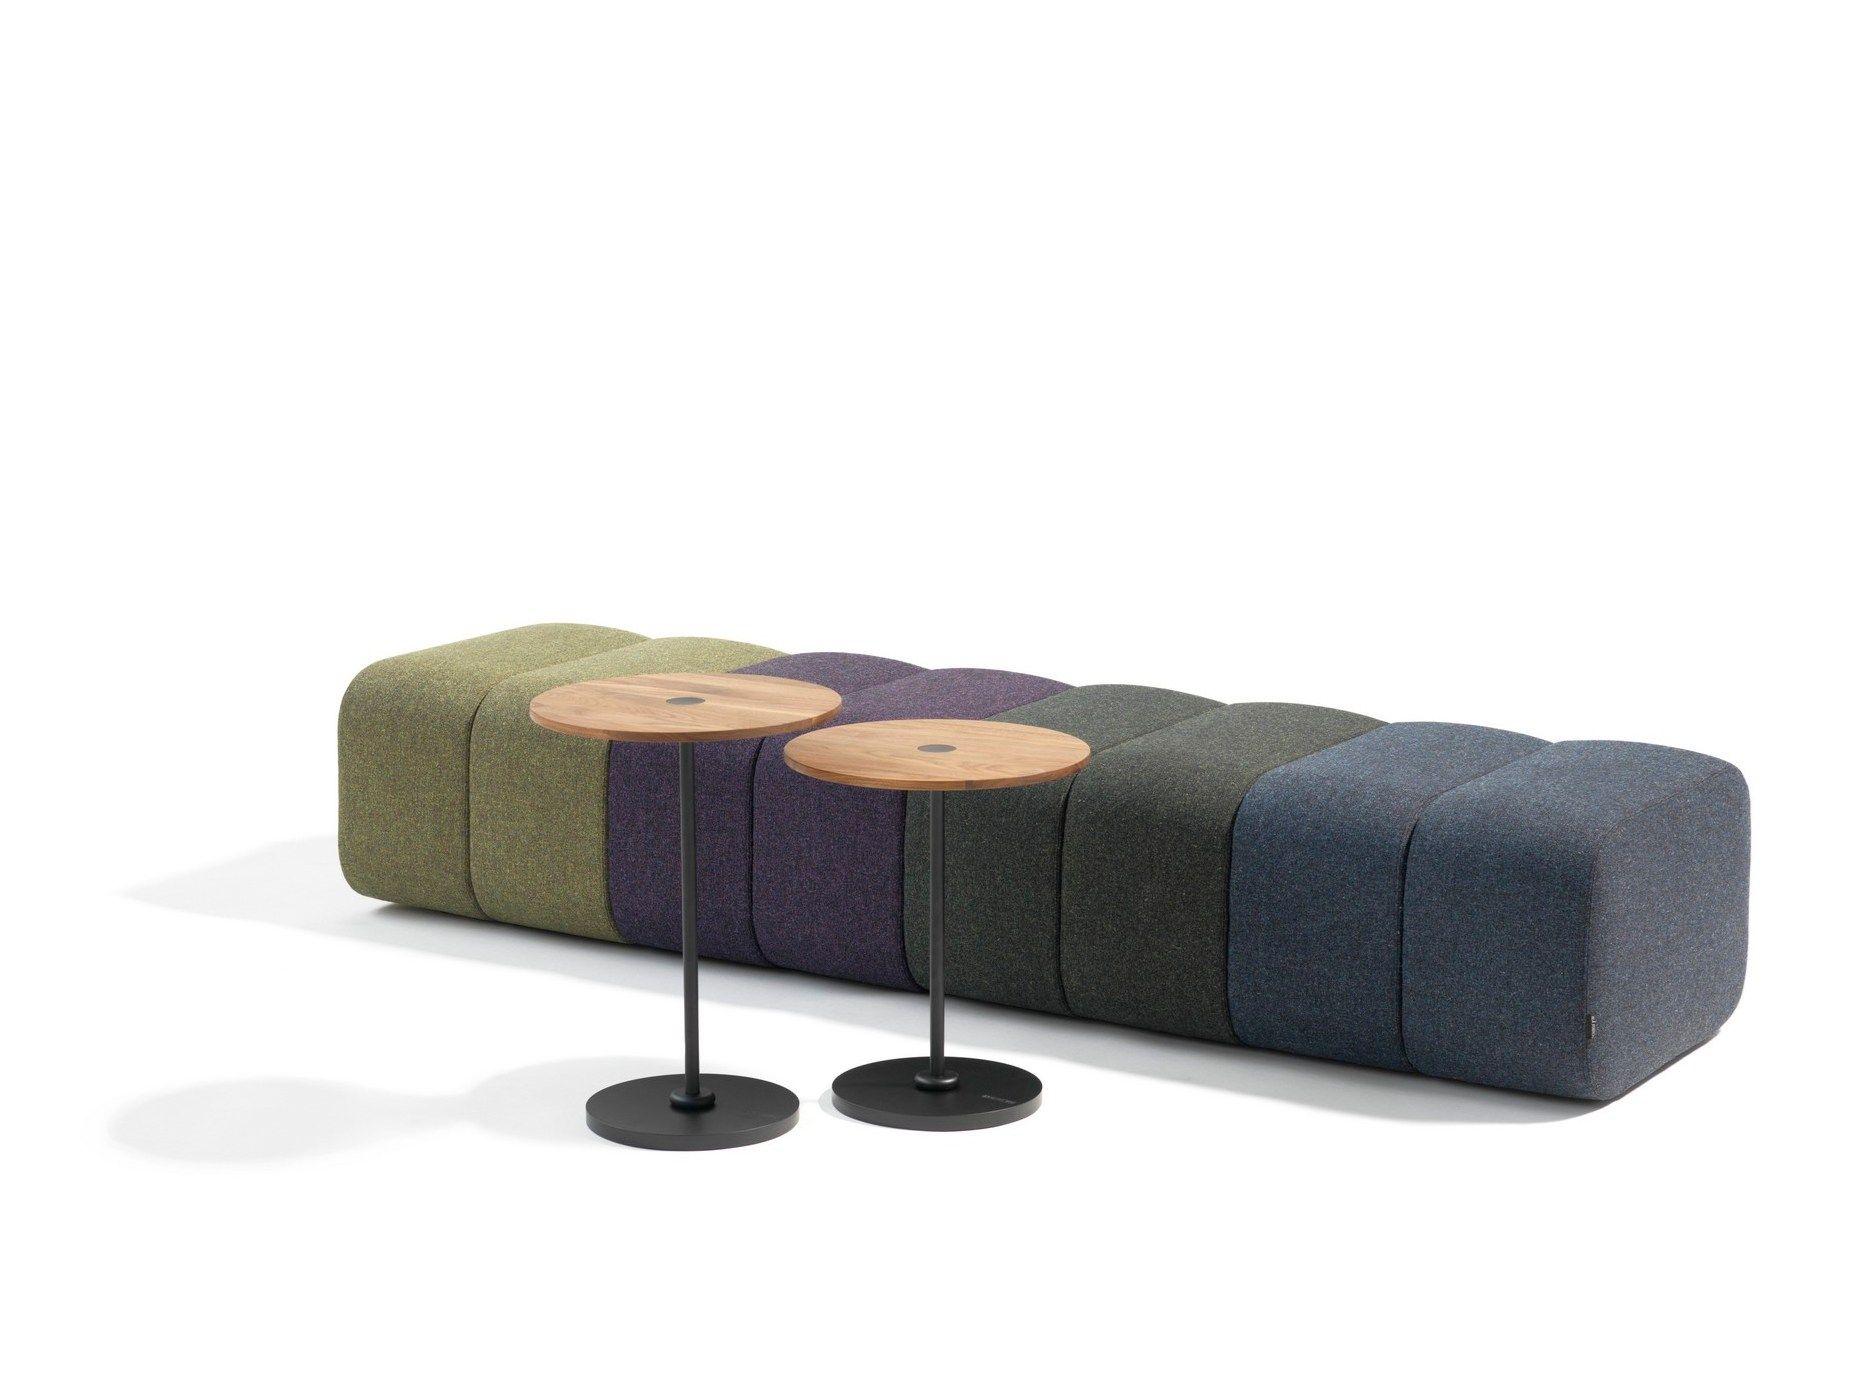 bob pouf collezione bob by bl station design stefan borselius thomas bernstrand. Black Bedroom Furniture Sets. Home Design Ideas